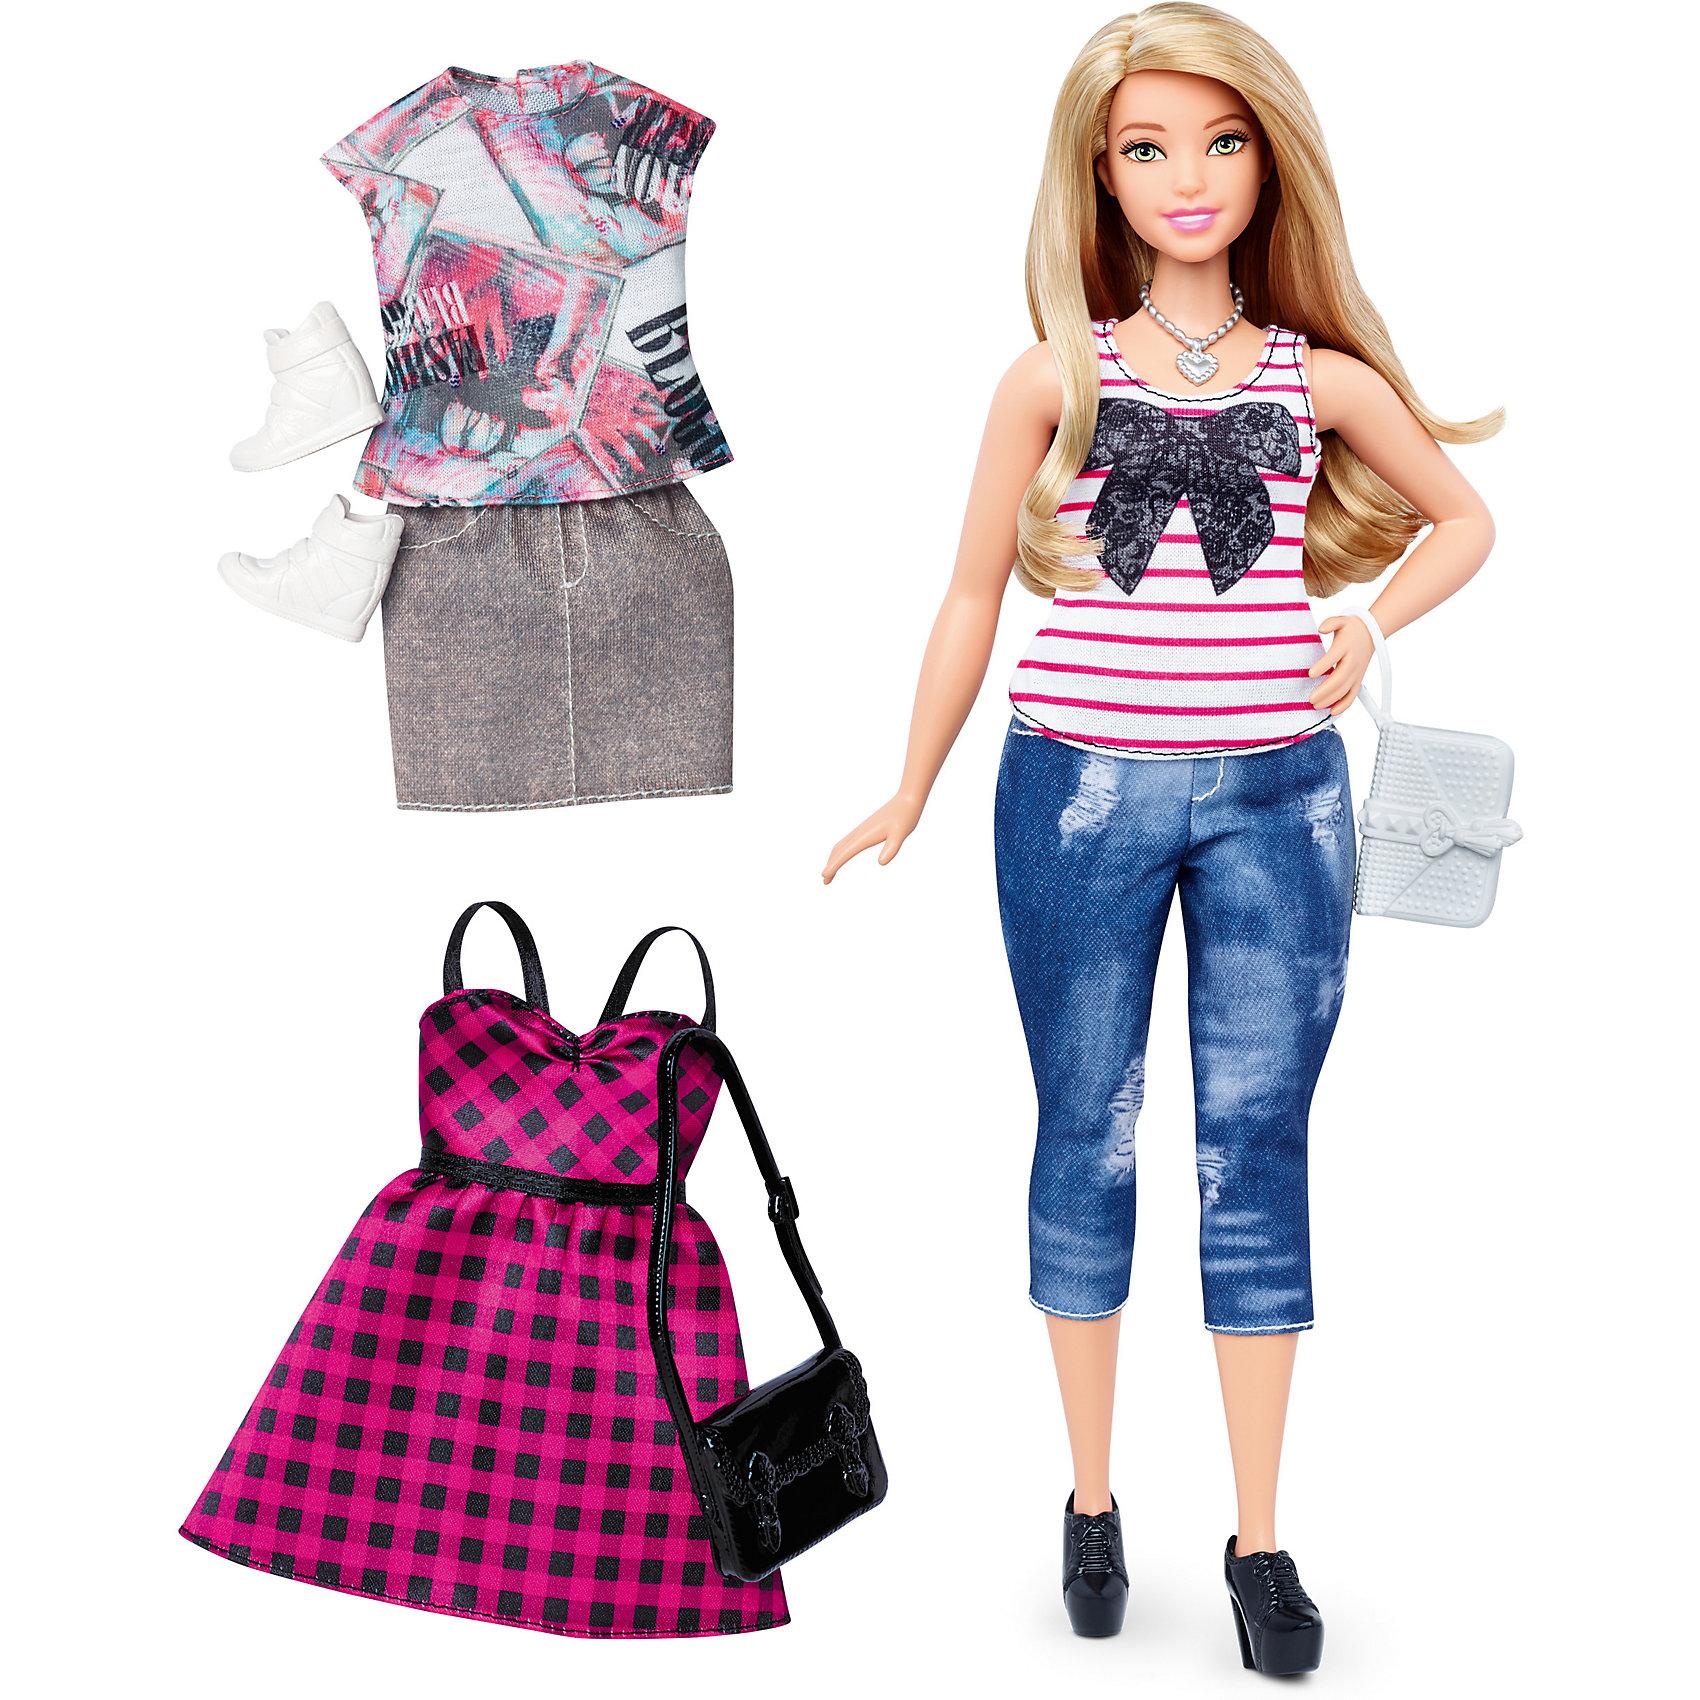 Mattel Кукла + набор одежды, Barbie